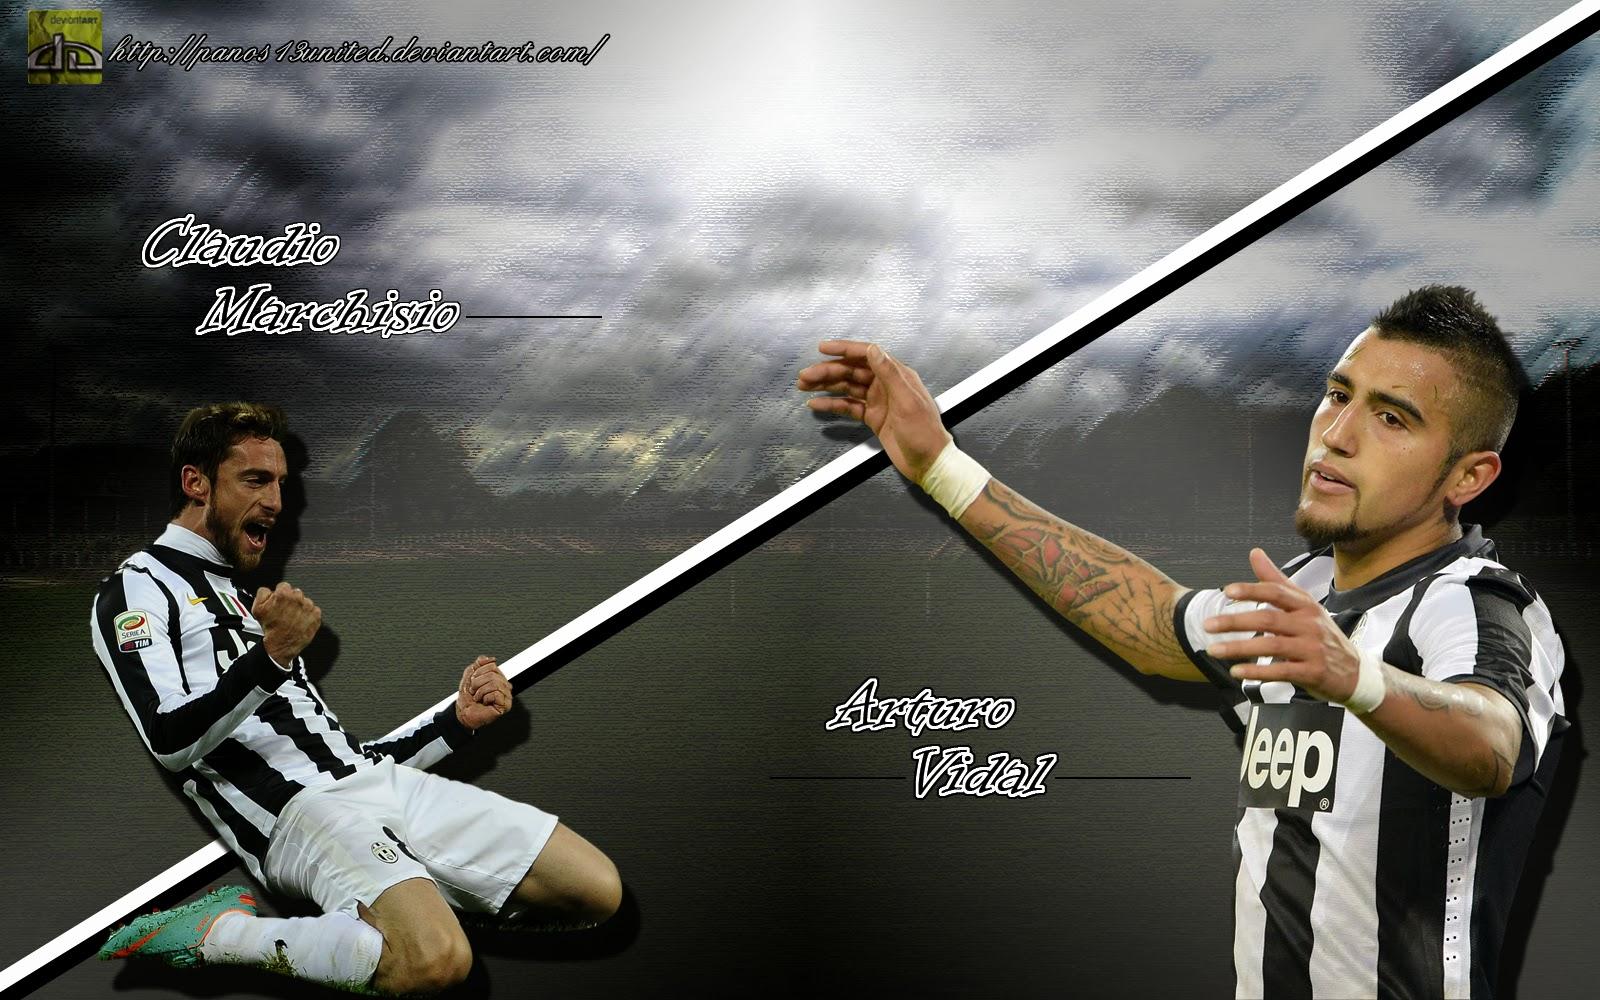 ciao tutti i tifosi bianconeri (Halo semua pendukung Juventus) title=